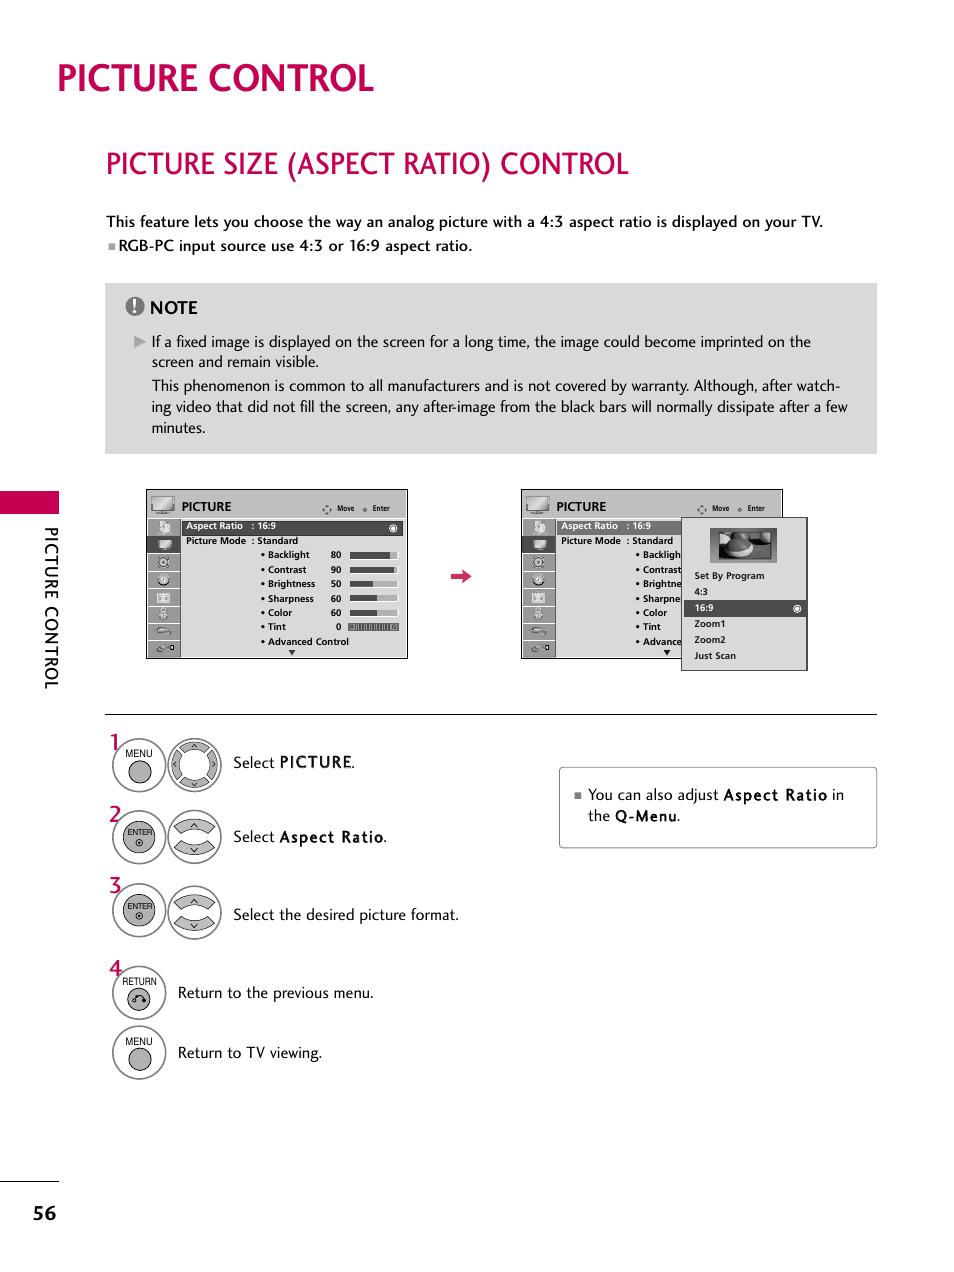 Picture control, Picture size (aspect ratio) control